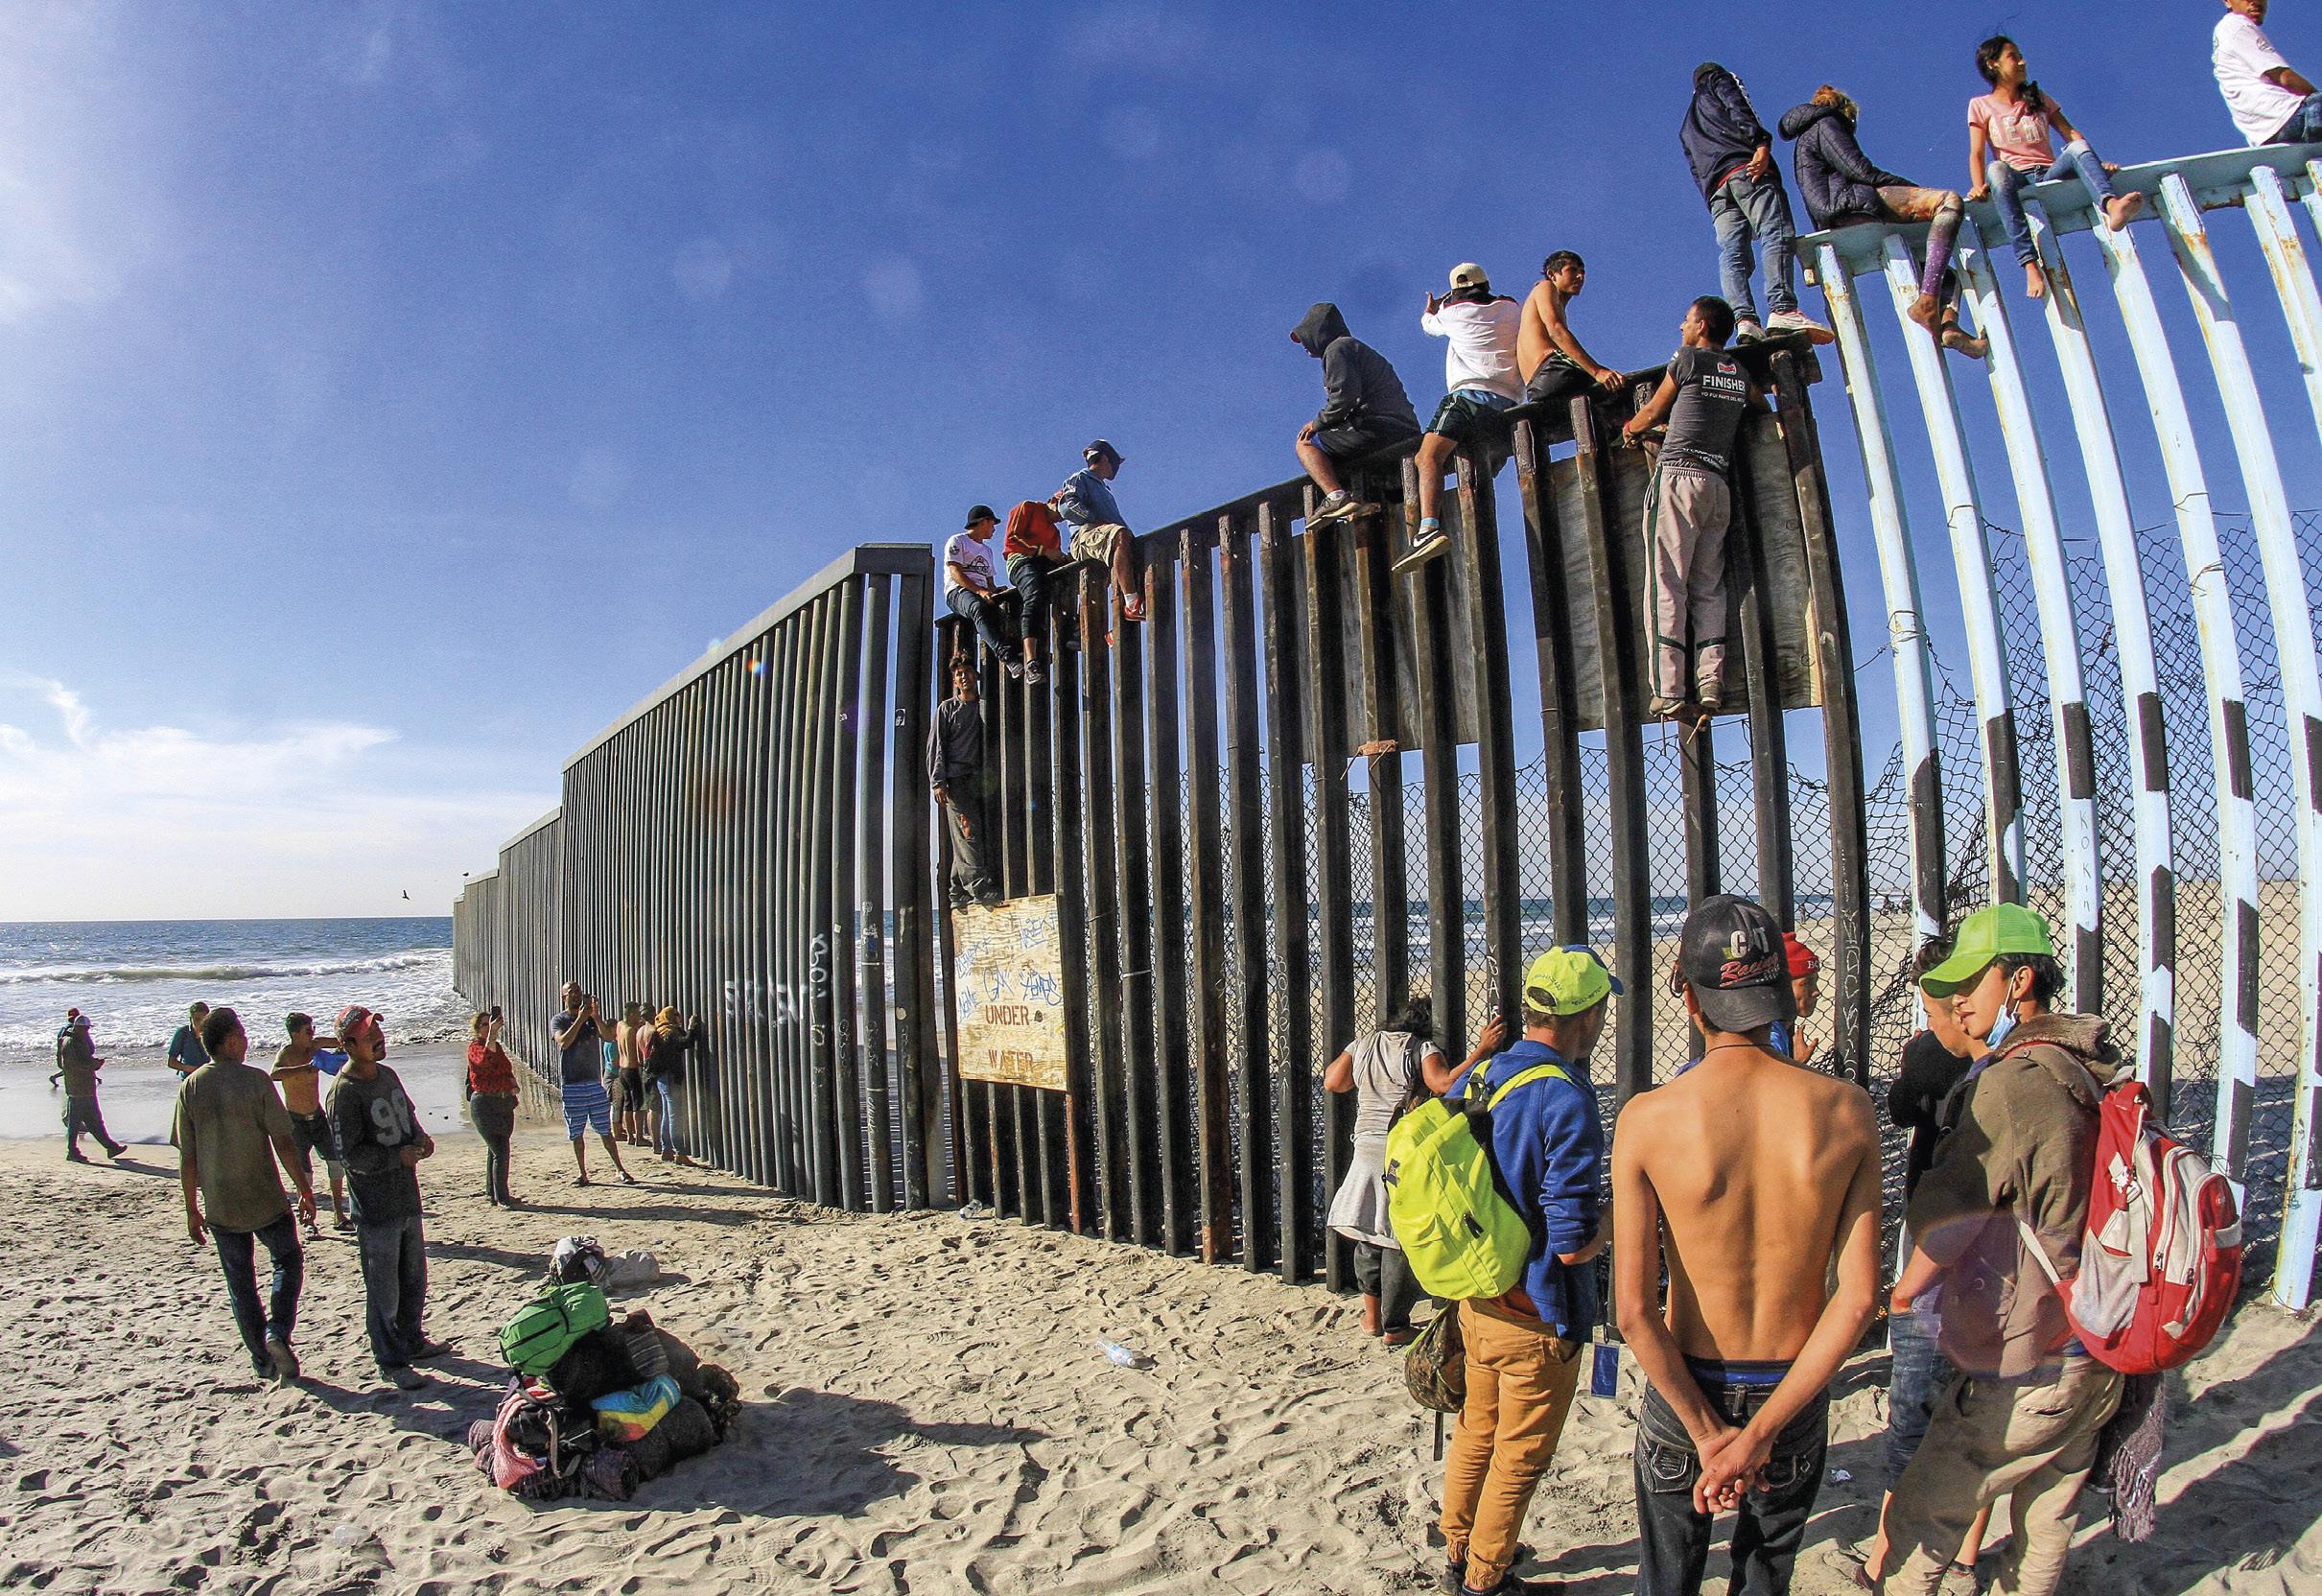 Caravana de migrantes centro-americanos escalam o muro da fronteira entre o México e os Estados Unidos, em Tijuana, novembro de 2018. EPA / JOEBETH TERRIQUEZ